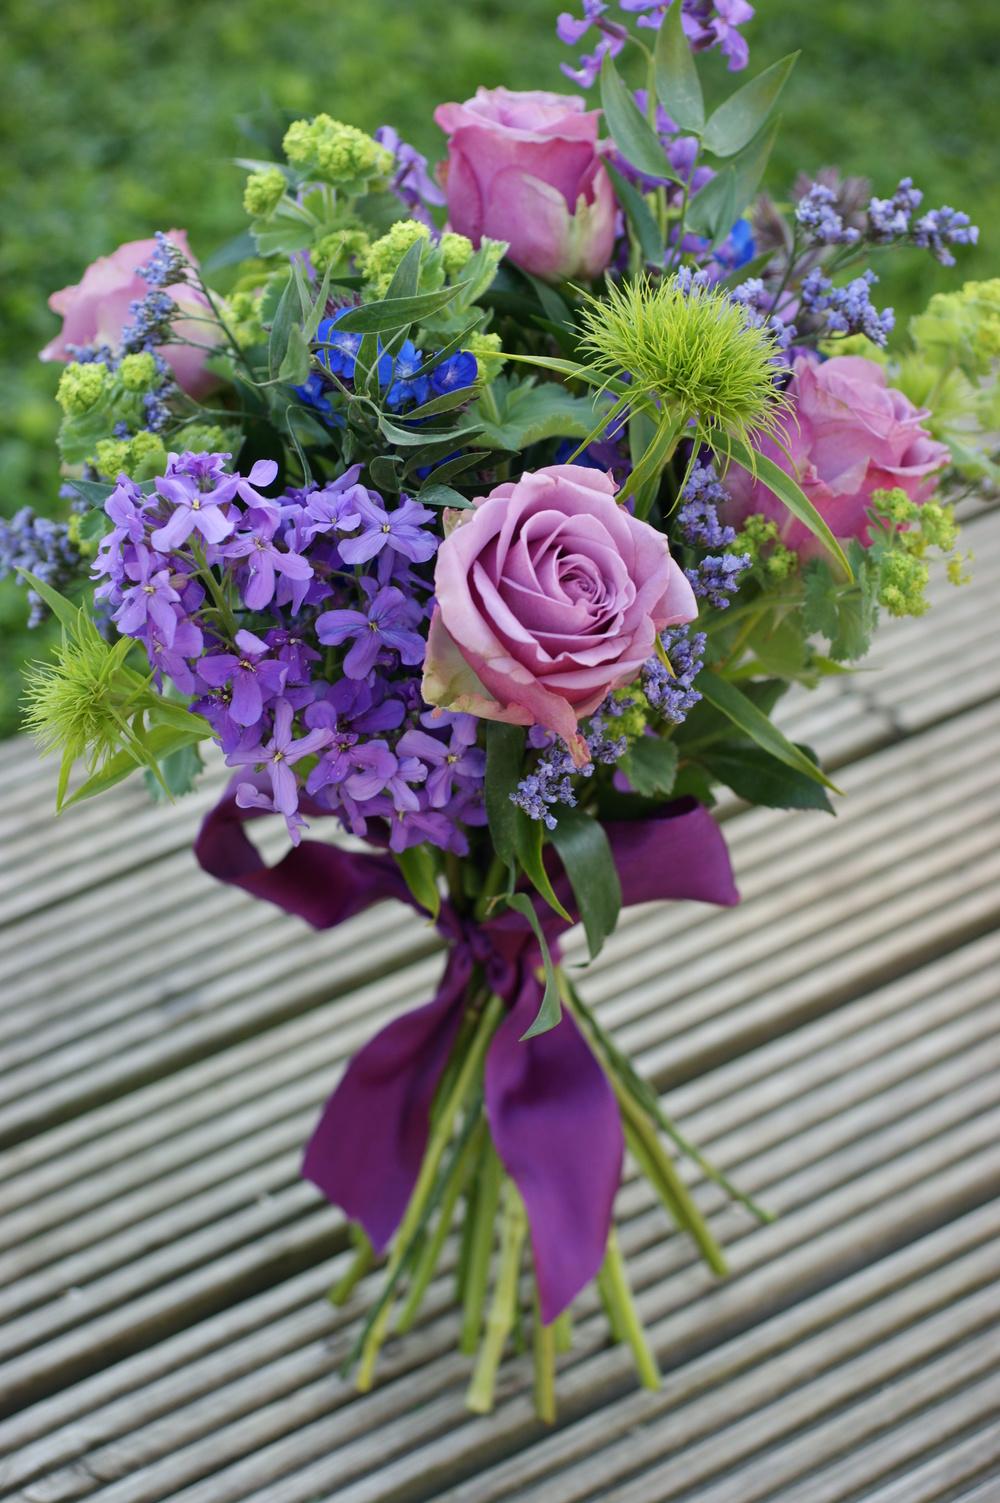 garden and floristry 1 434.JPG